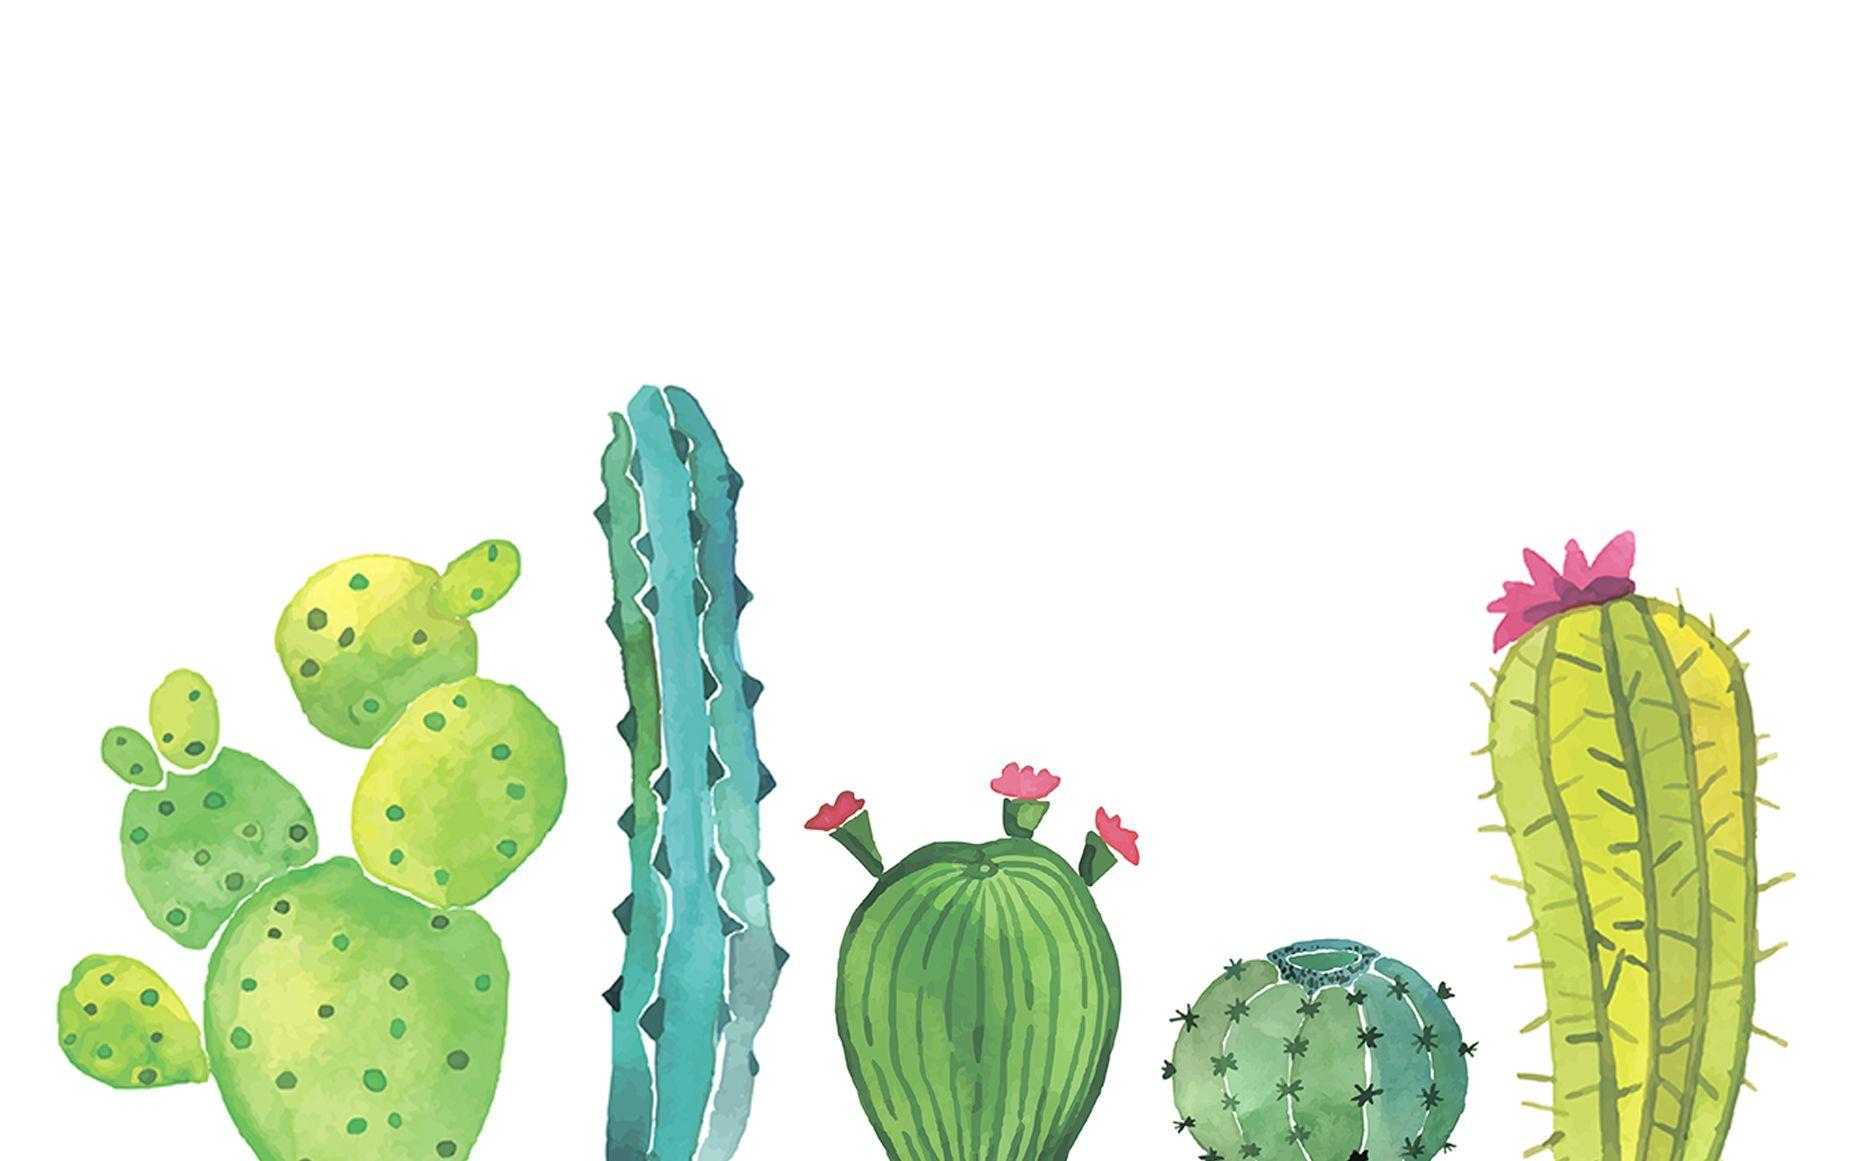 Cactus Desktop Wallpaper Tell Me Tuesday Blog Arkaplan Tasarimlari Kaktus Retro Posterler